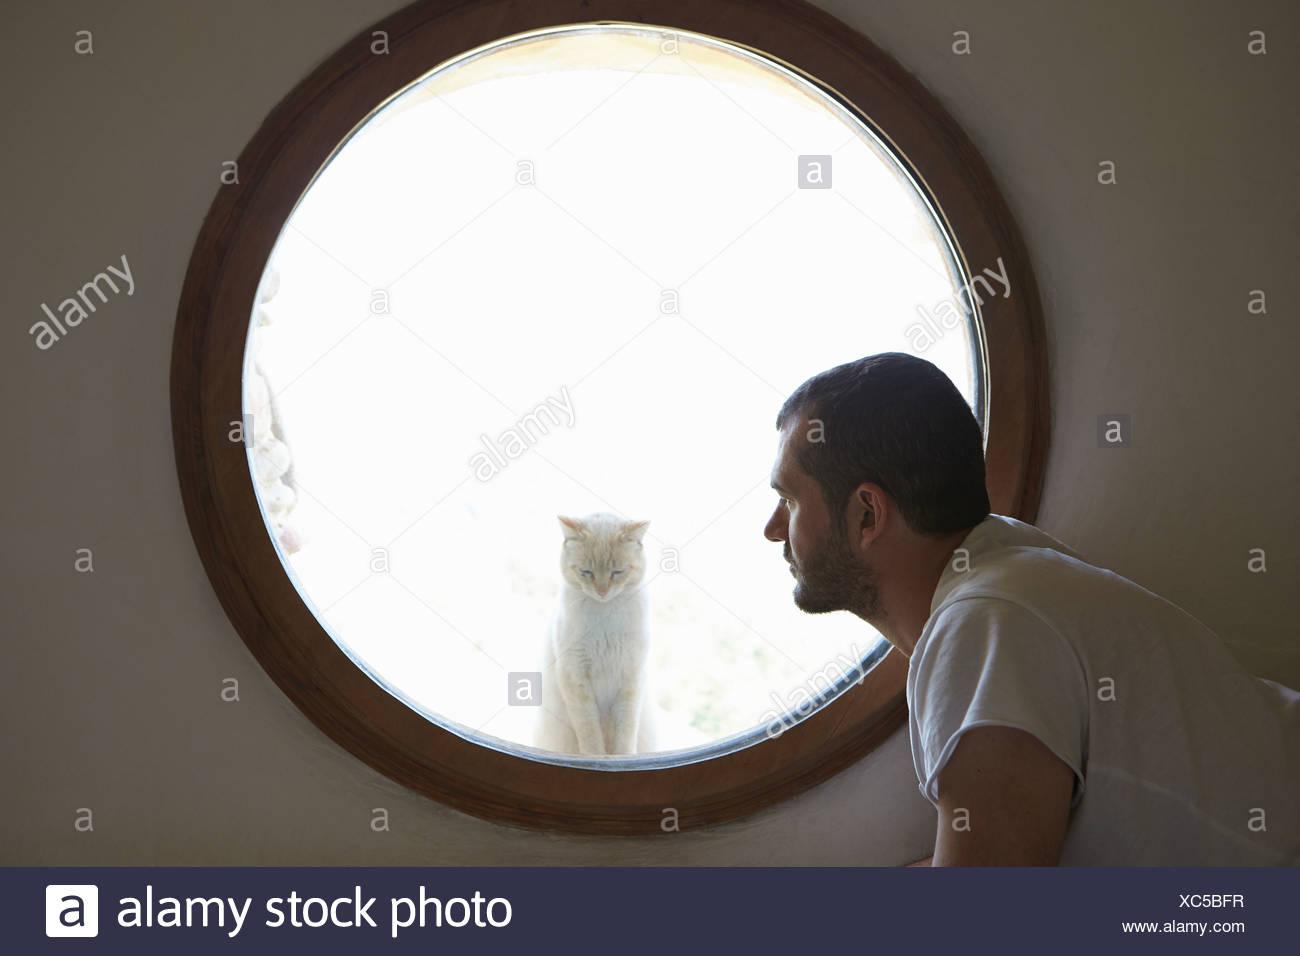 Mid adult man gazing at cat through circular window - Stock Image